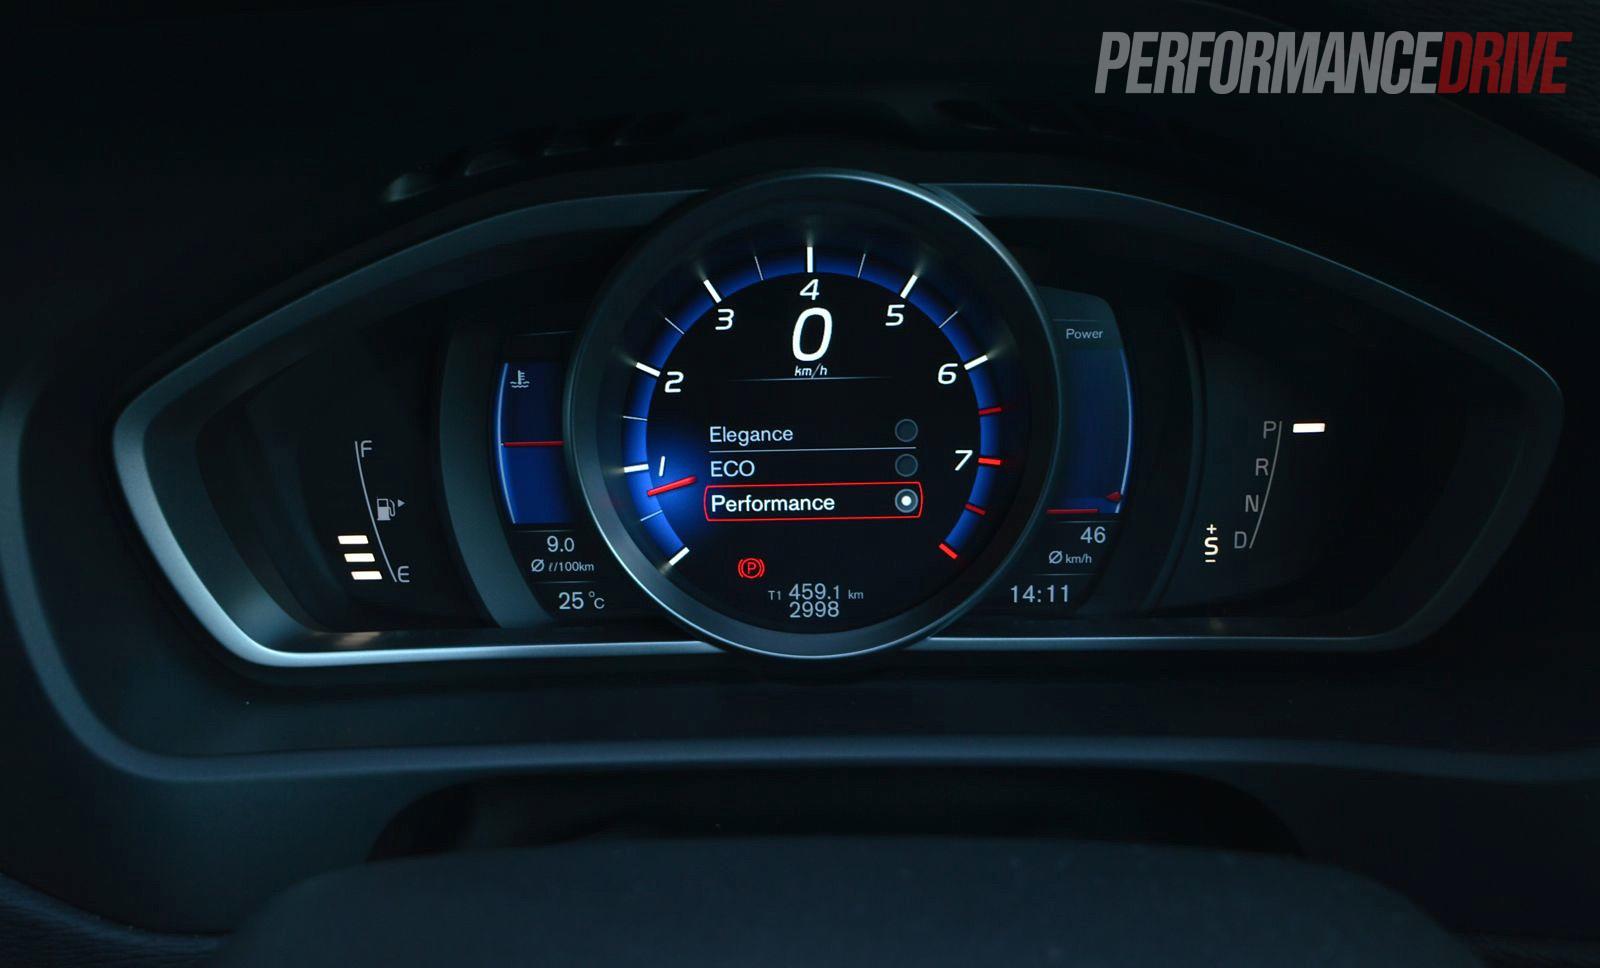 2013 Volvo V40 T5 Performance Instrument Cluster